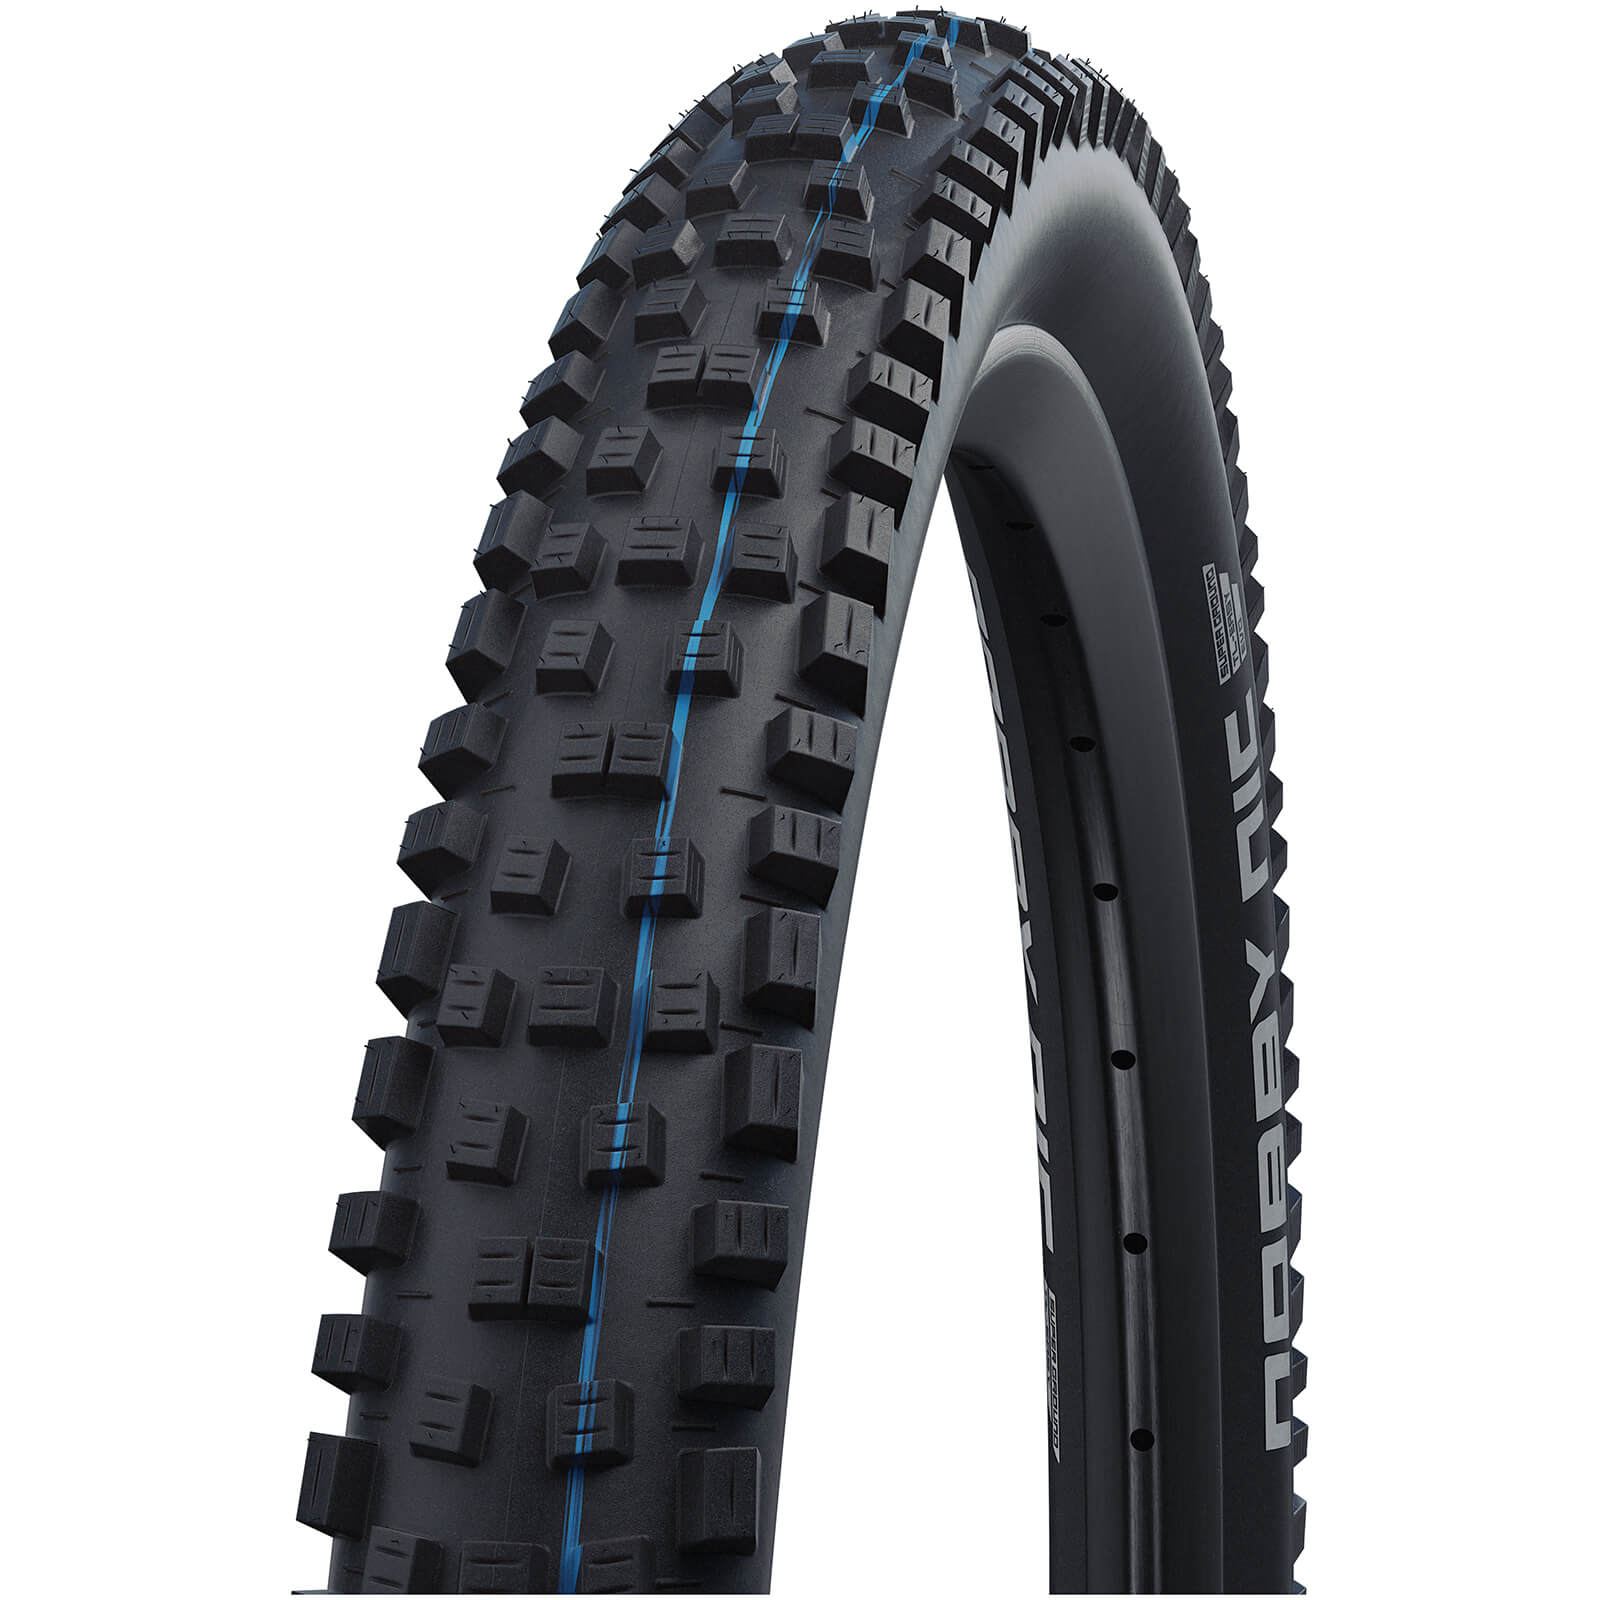 Schwalbe Nobby Nic Evo Super Trail Tubeless MTB Tyre - Black - 27.5in x 2.80in